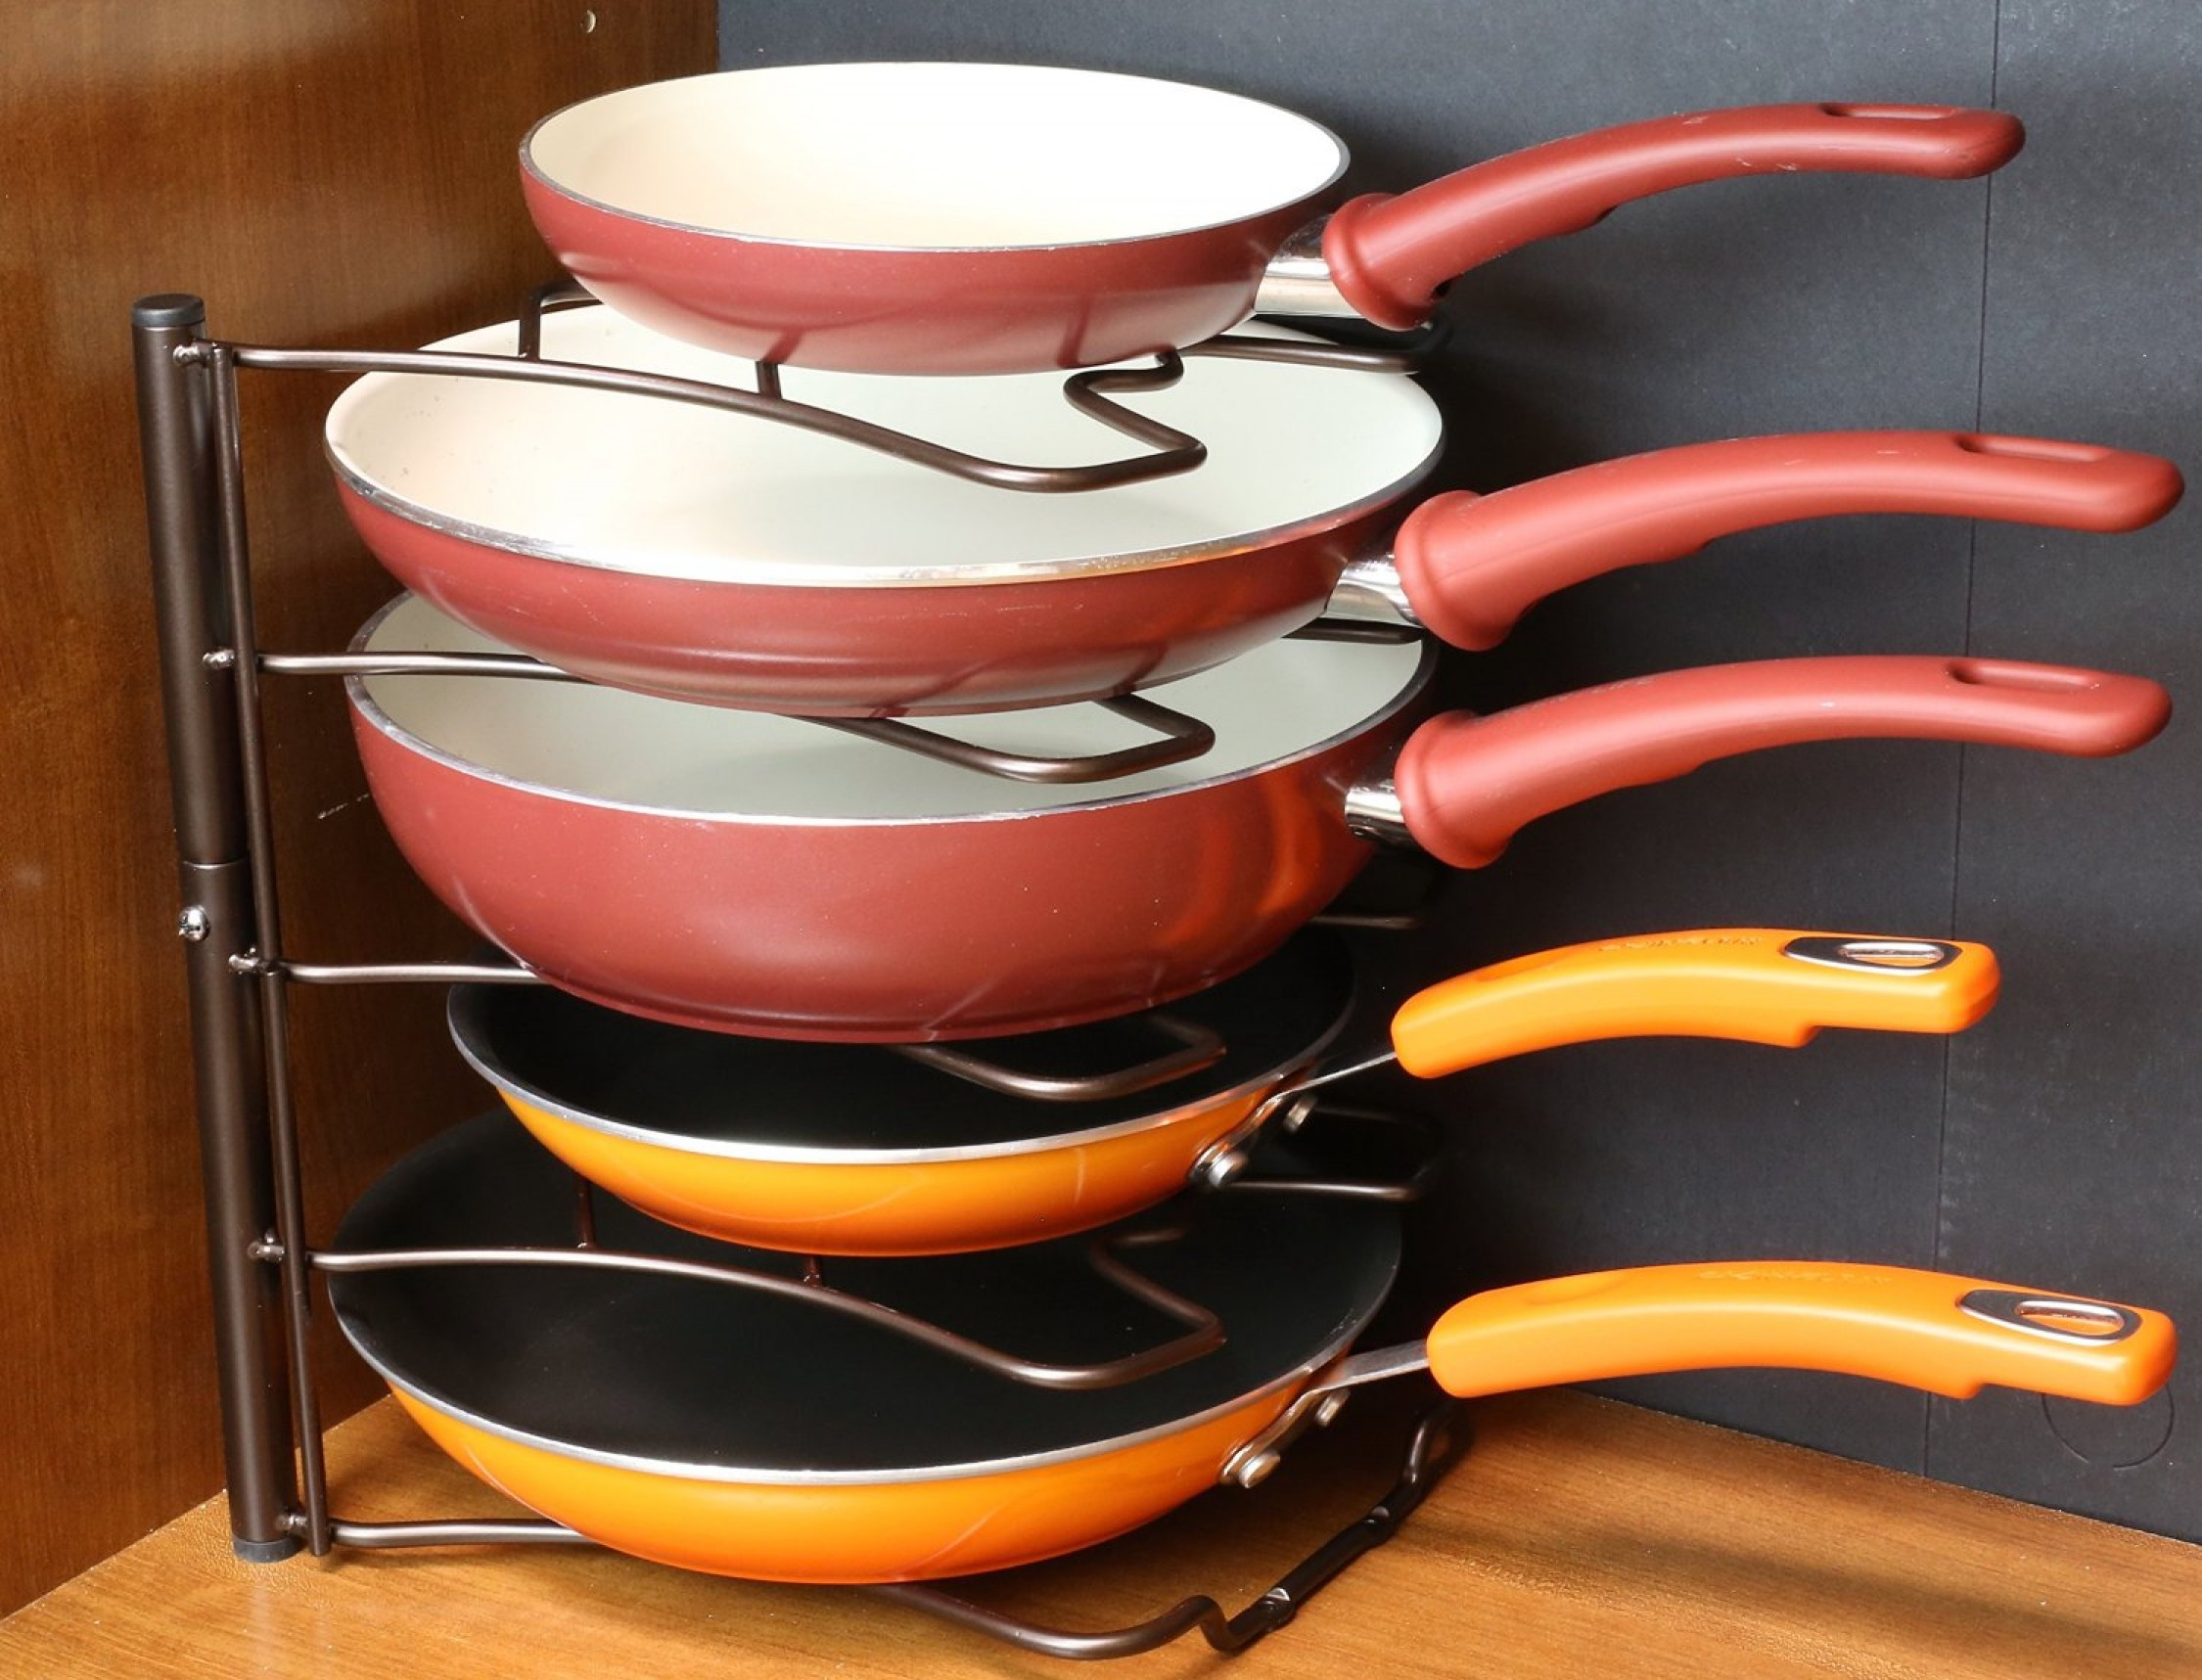 Counter & Cabinet Pan Organizer Shelf Rack Kitchen